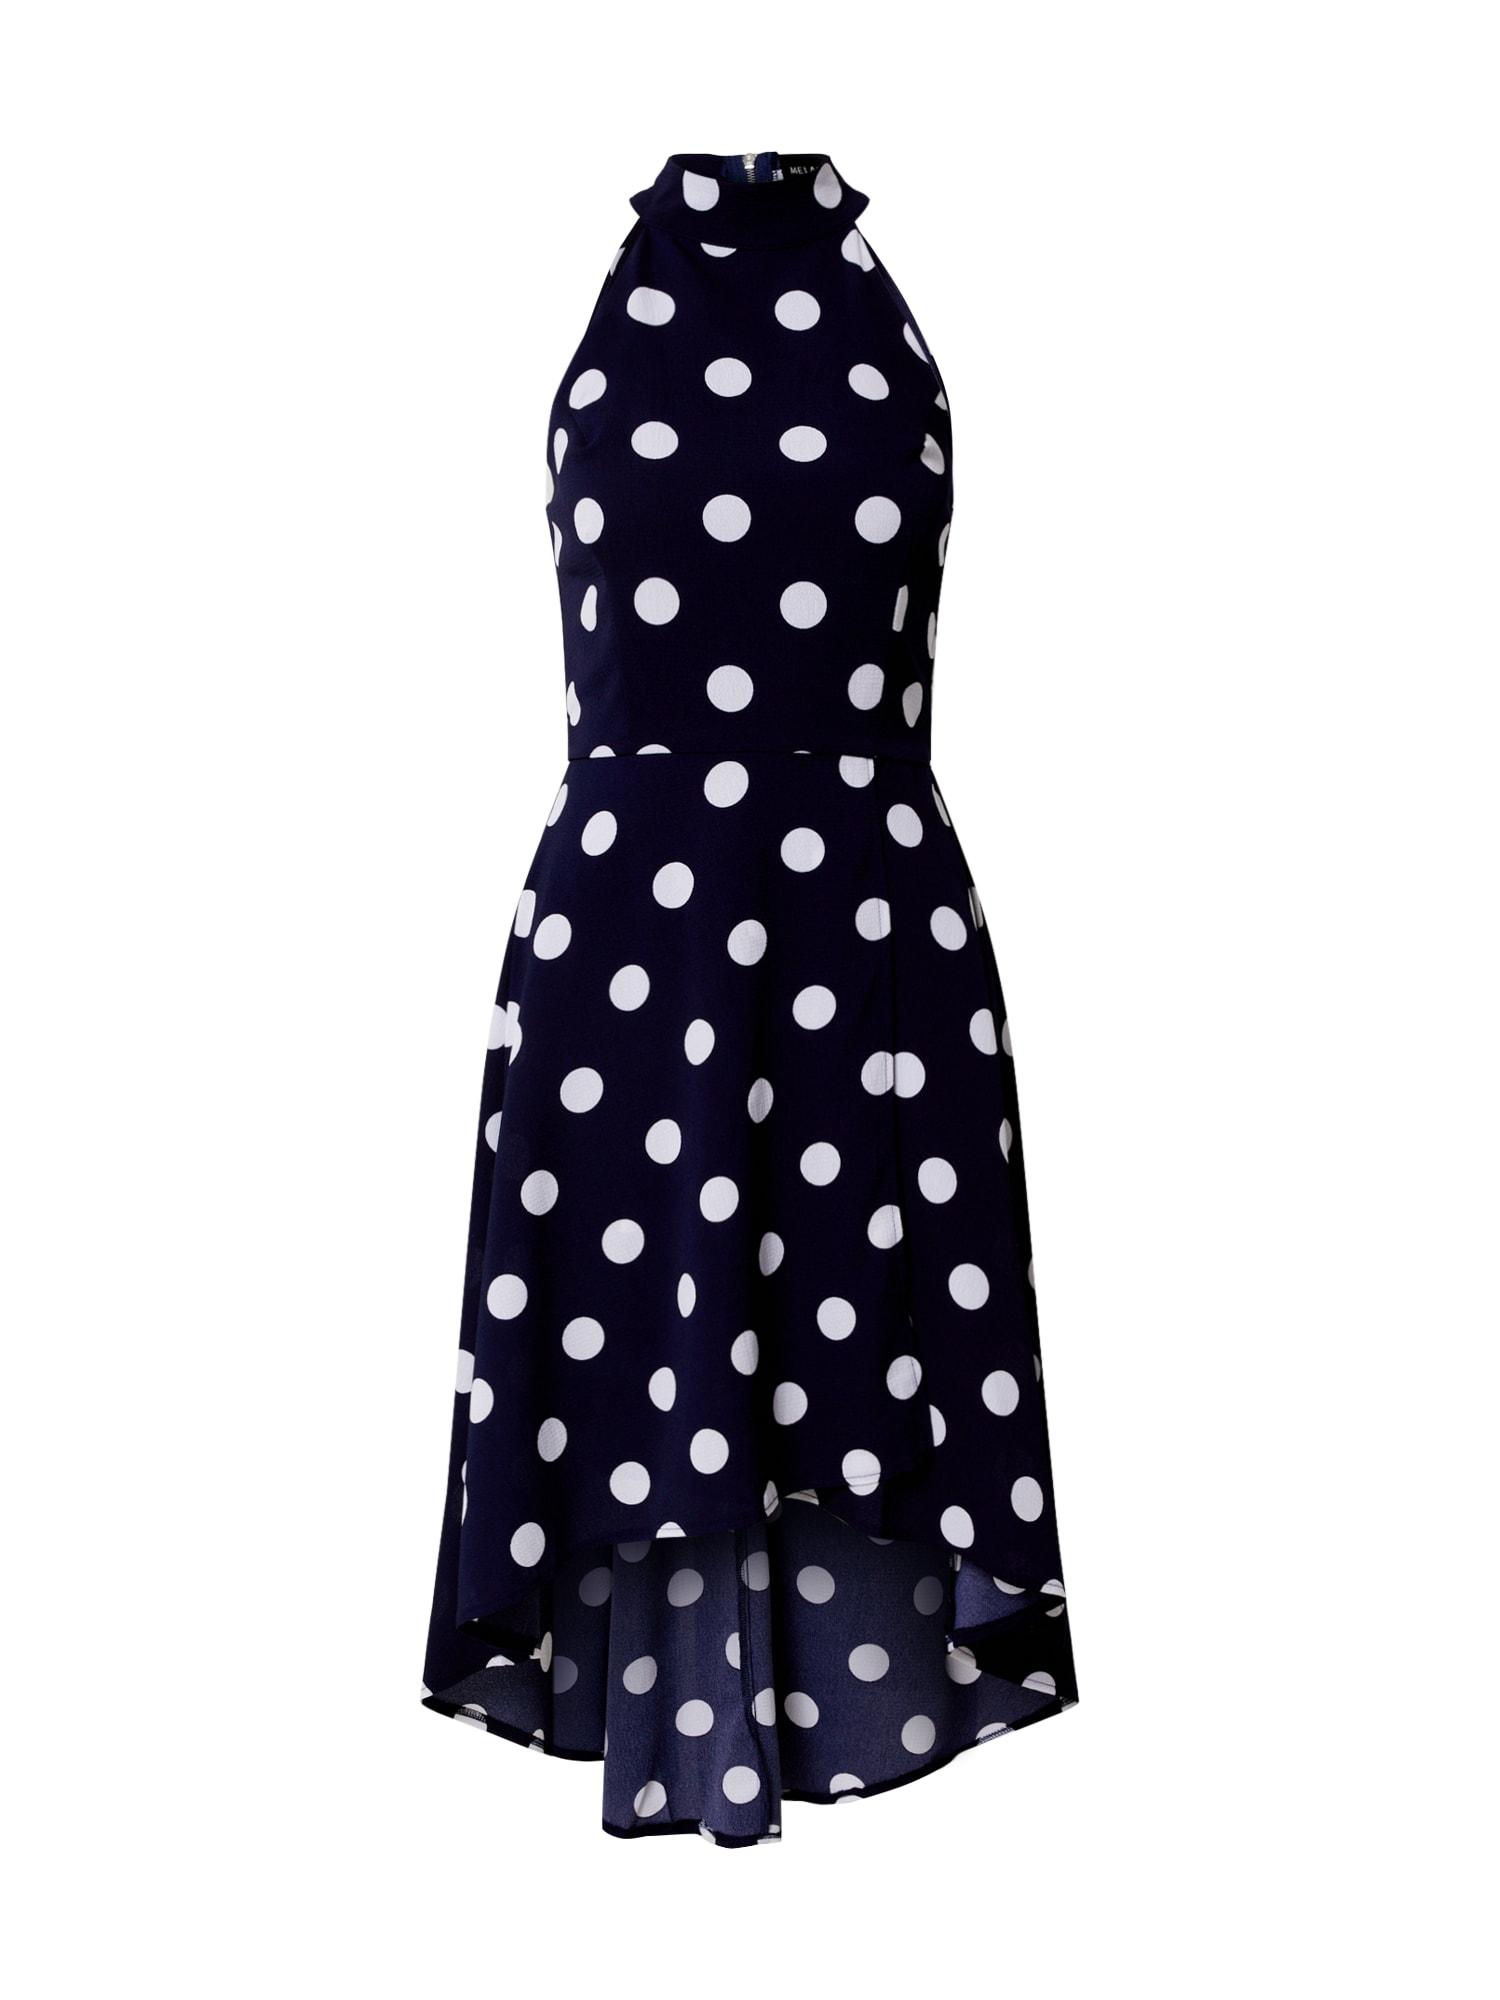 Mela London Suknelė 'Polka Dot' tamsiai mėlyna / balta